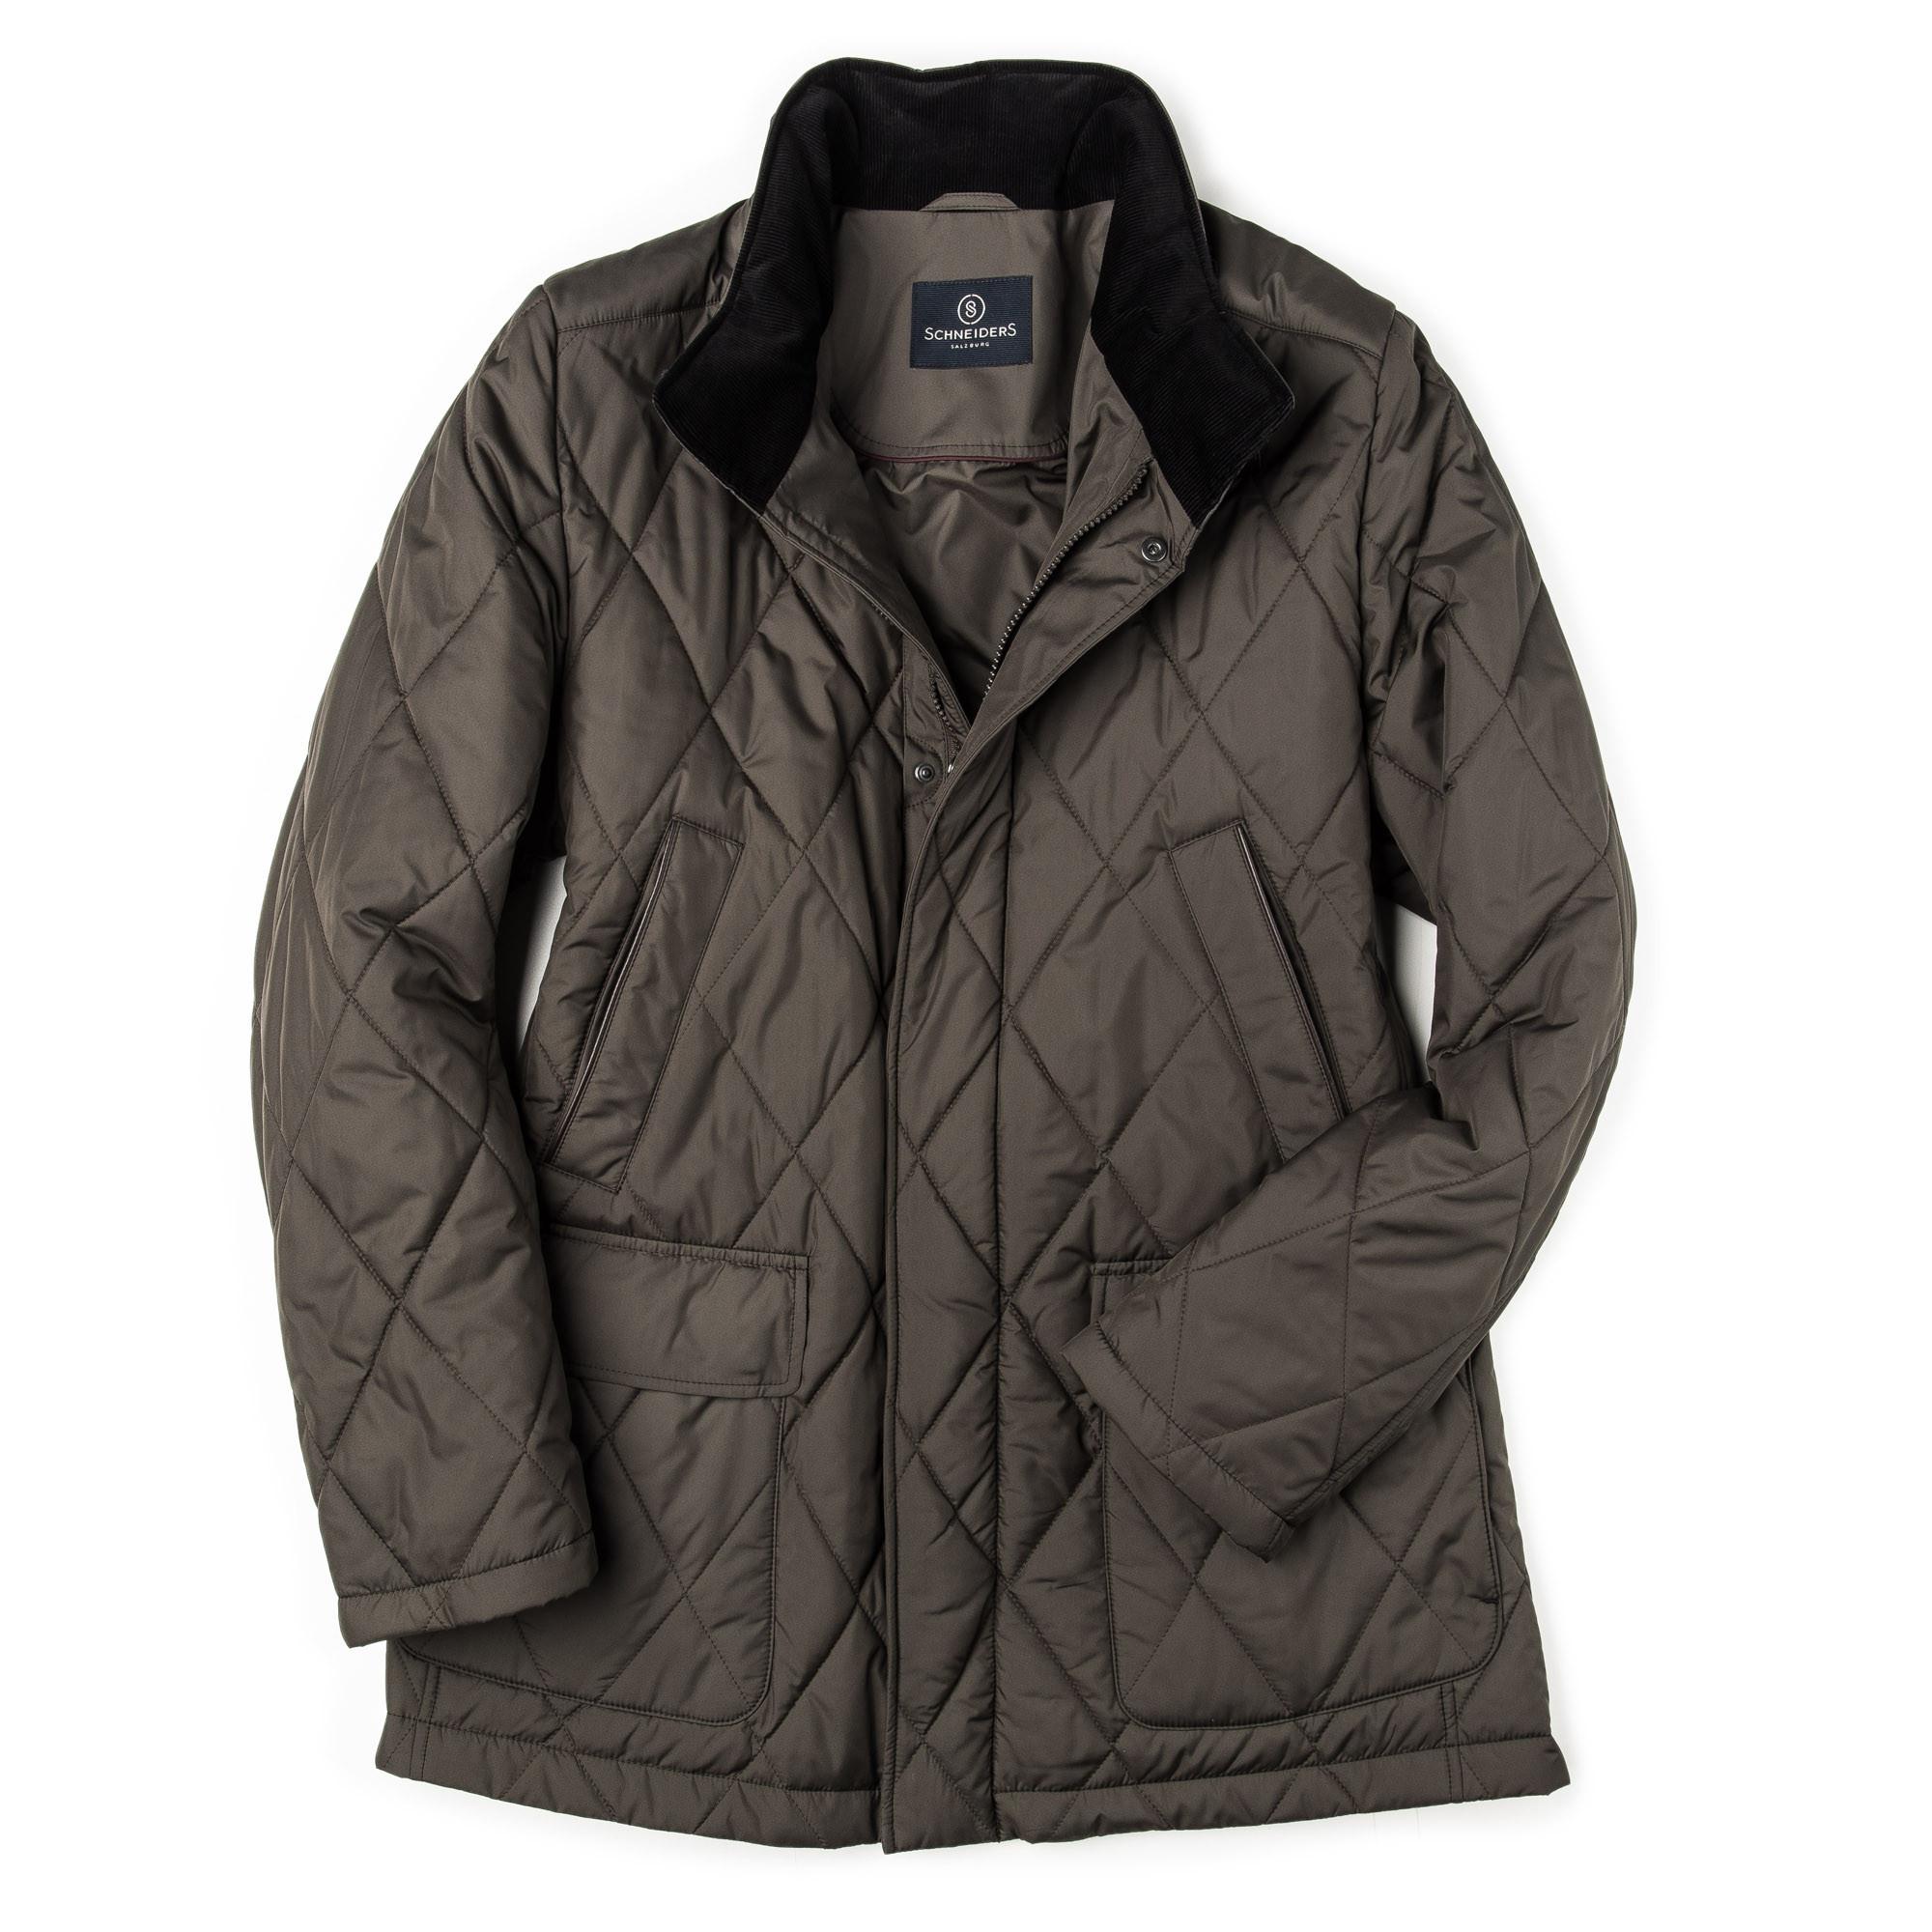 8a75df507371c Schneiders - Men s St. Moritz Gore Jacket